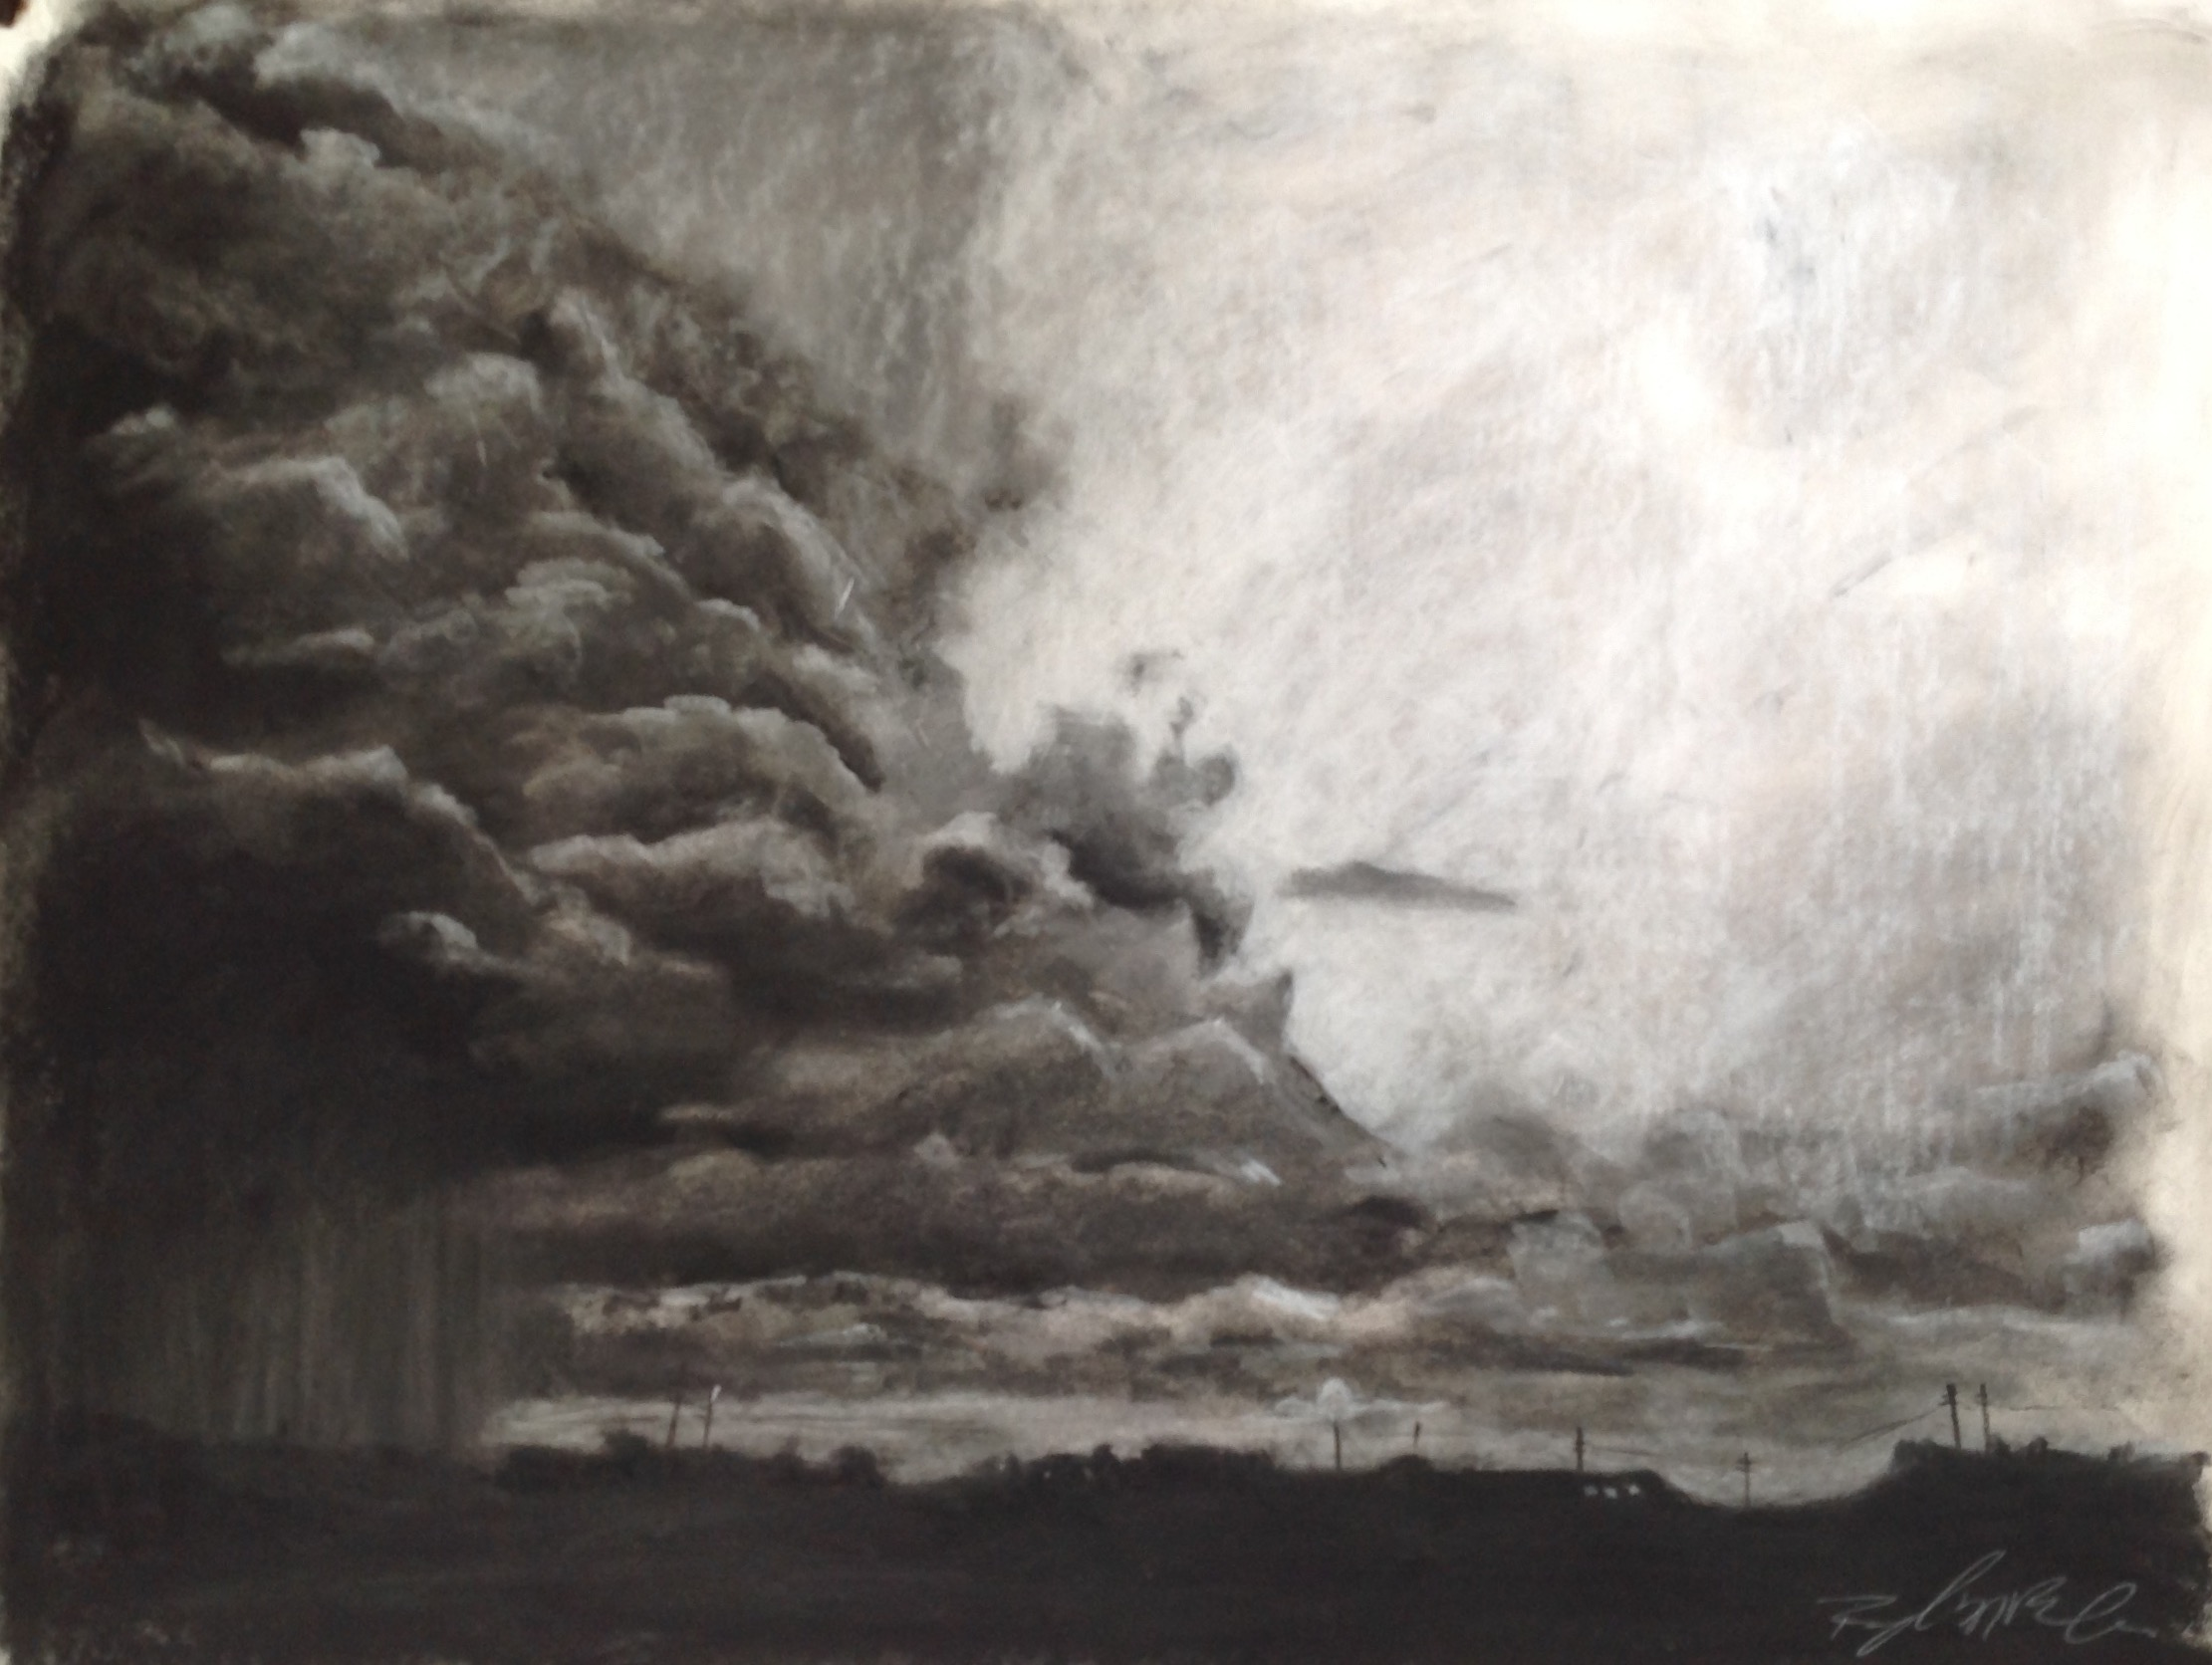 Head In The Clouds #4(It Looks Like